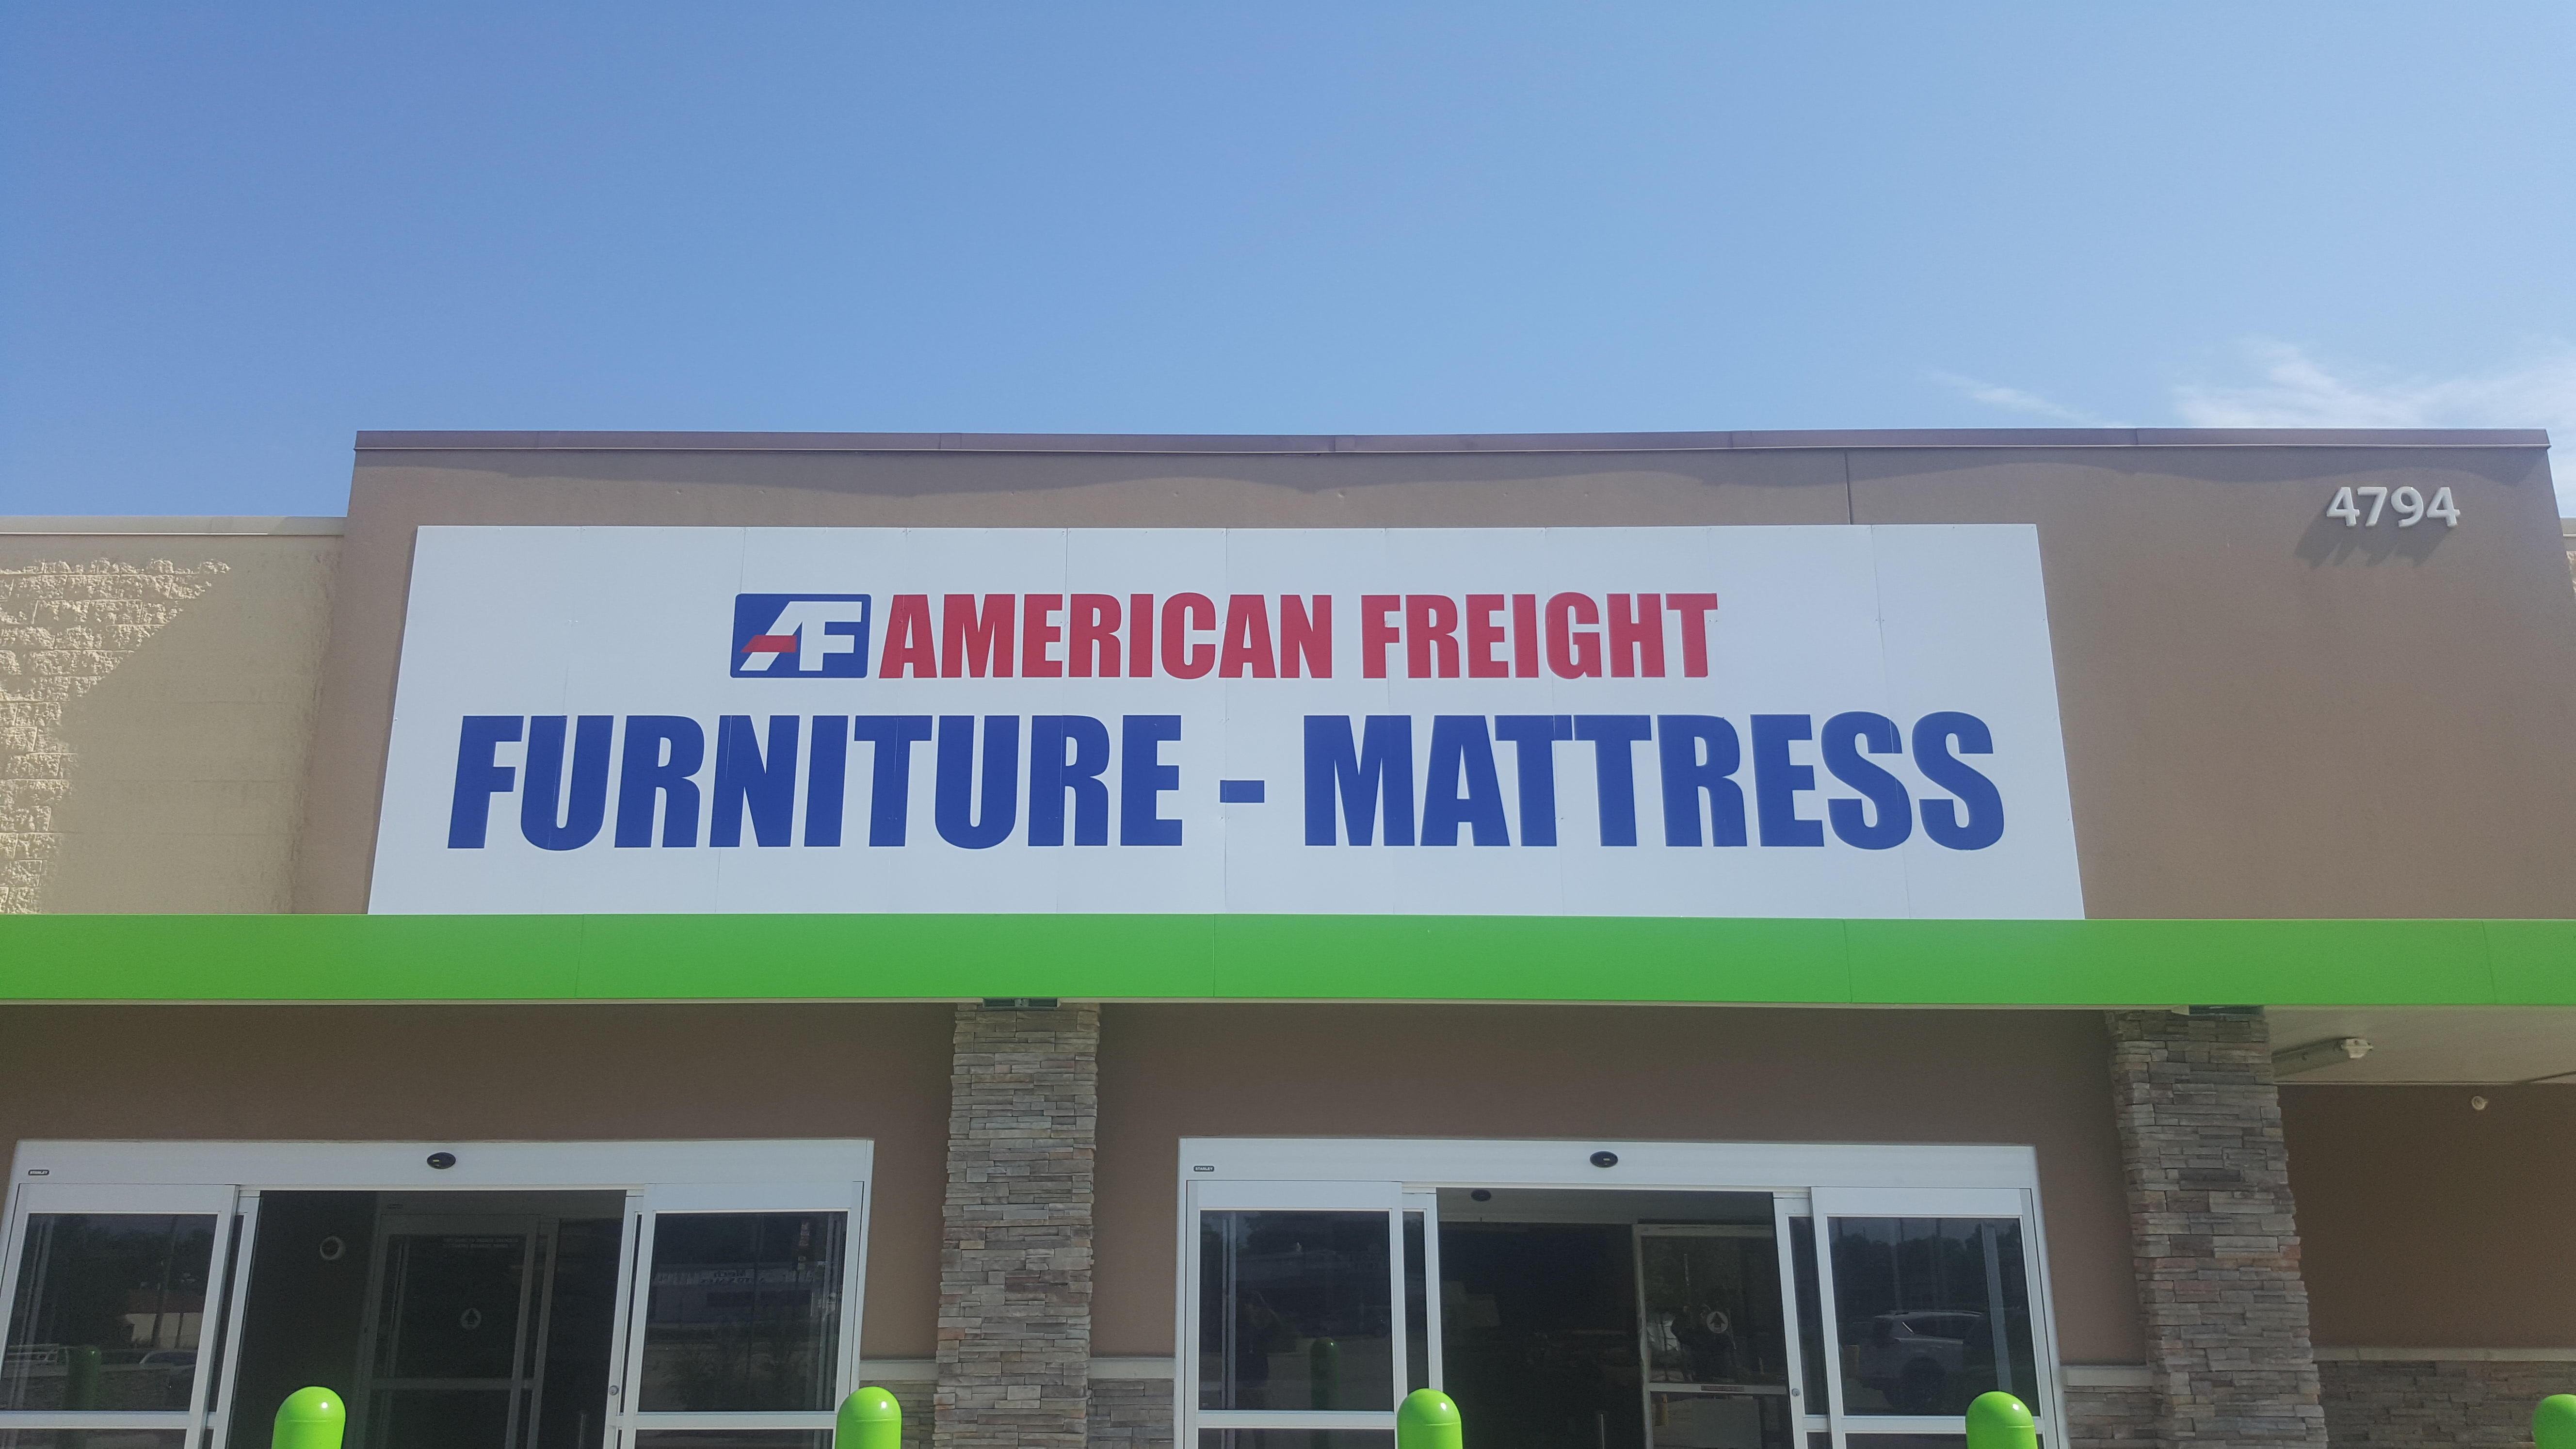 american freight furniture and mattress 4794 e 13th st n wichita ks 67208. Black Bedroom Furniture Sets. Home Design Ideas